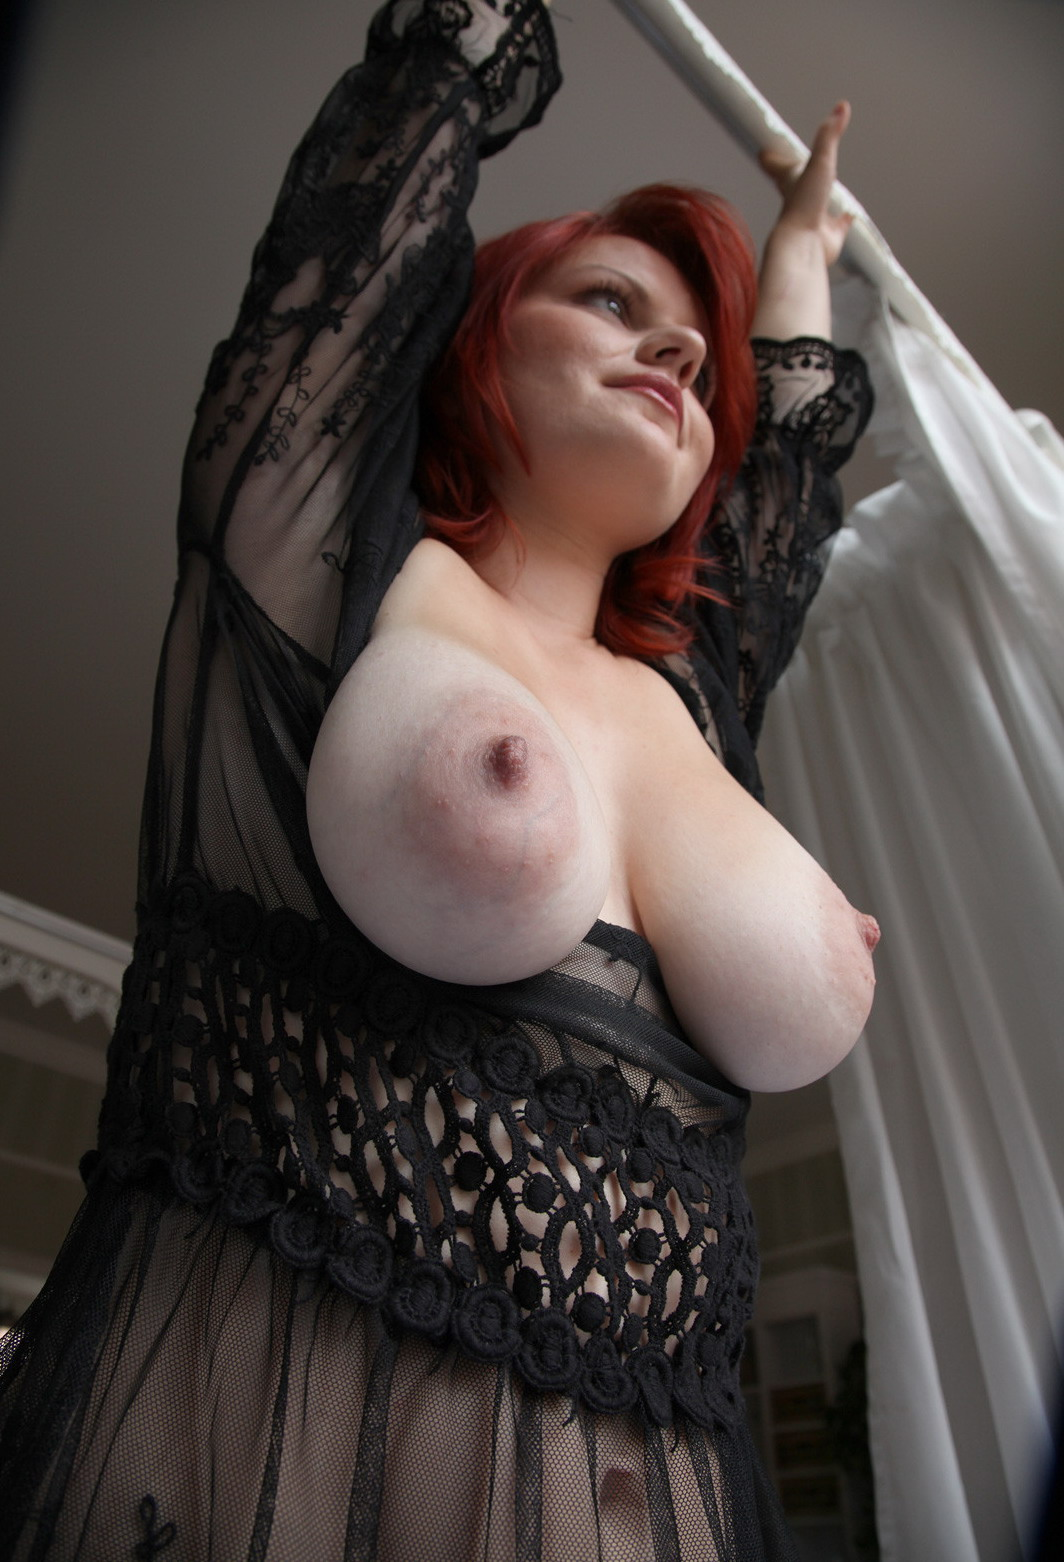 фото обвисшие женские груди